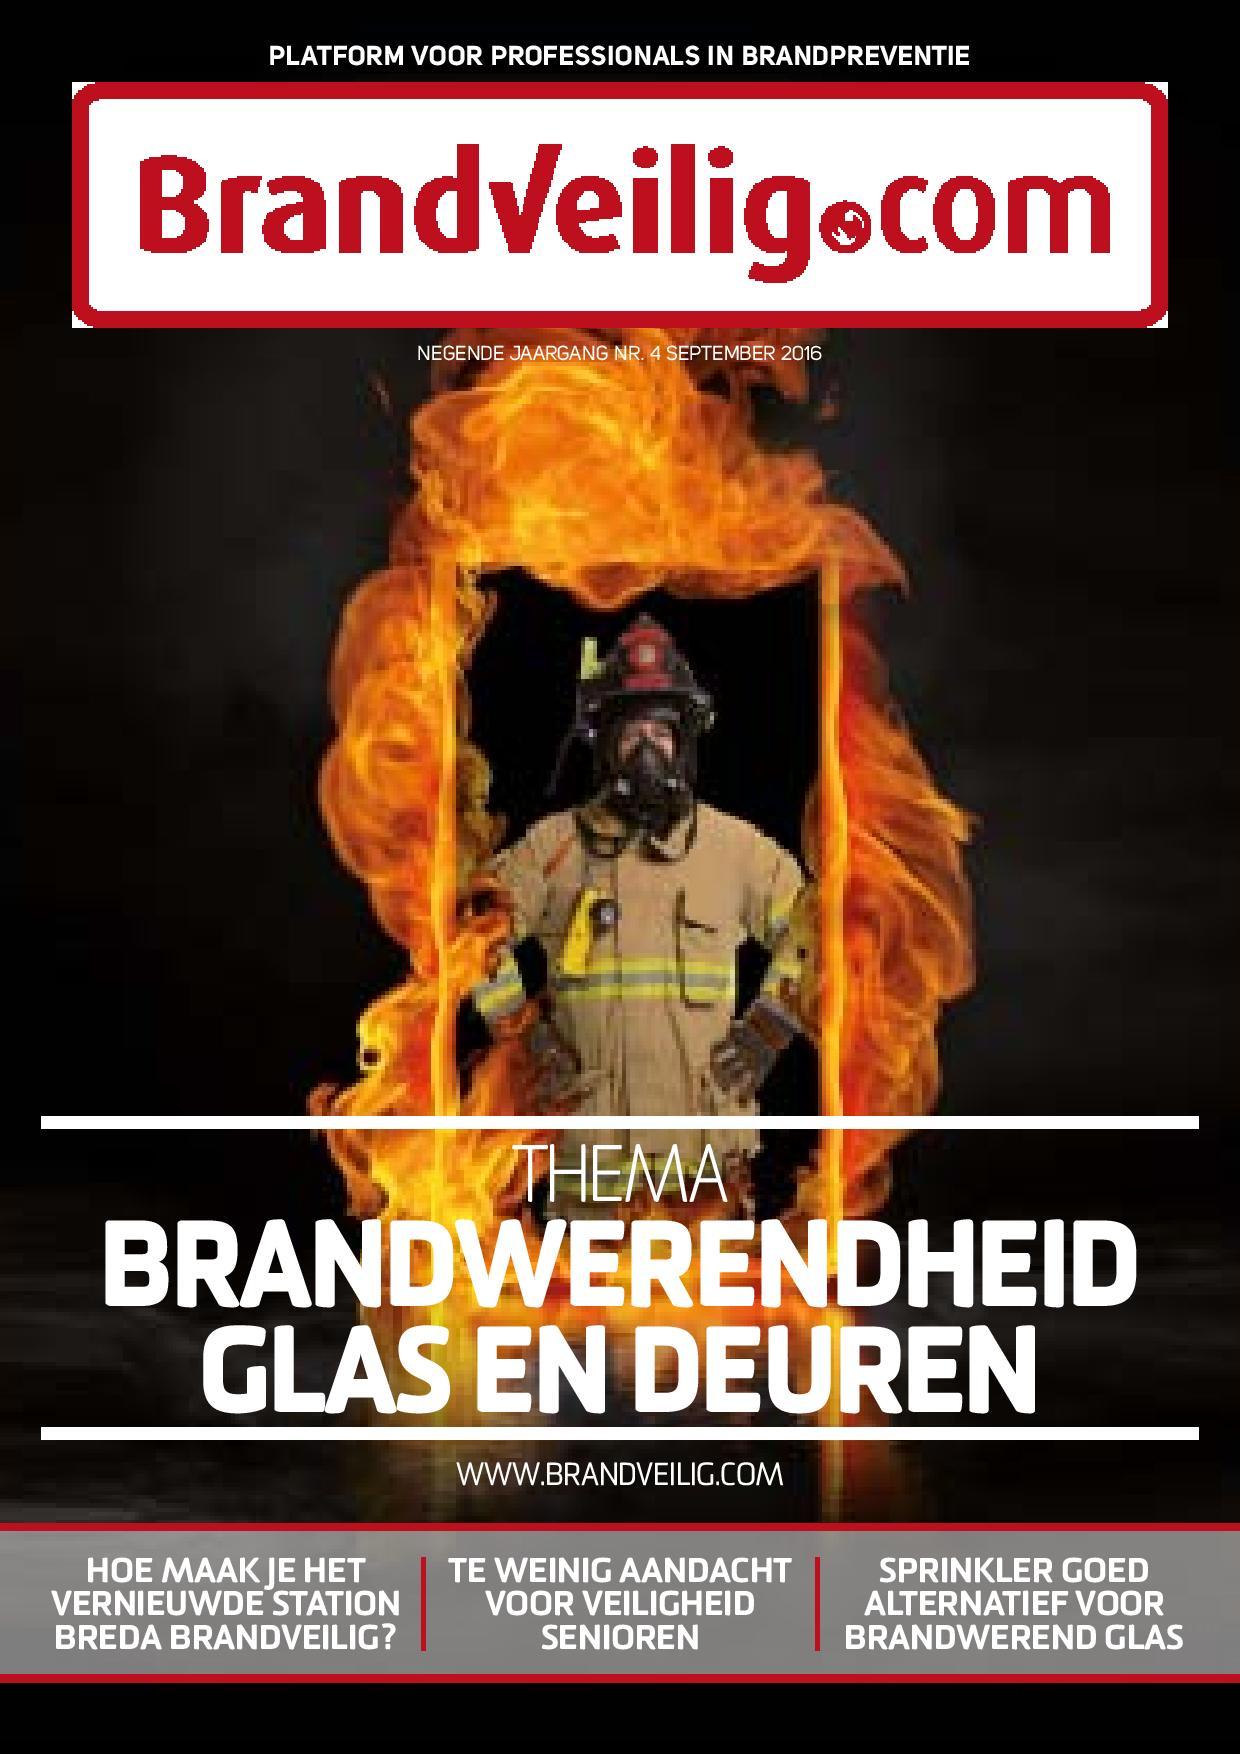 Brandveilig.com over Brandwerendheid glas en deuren